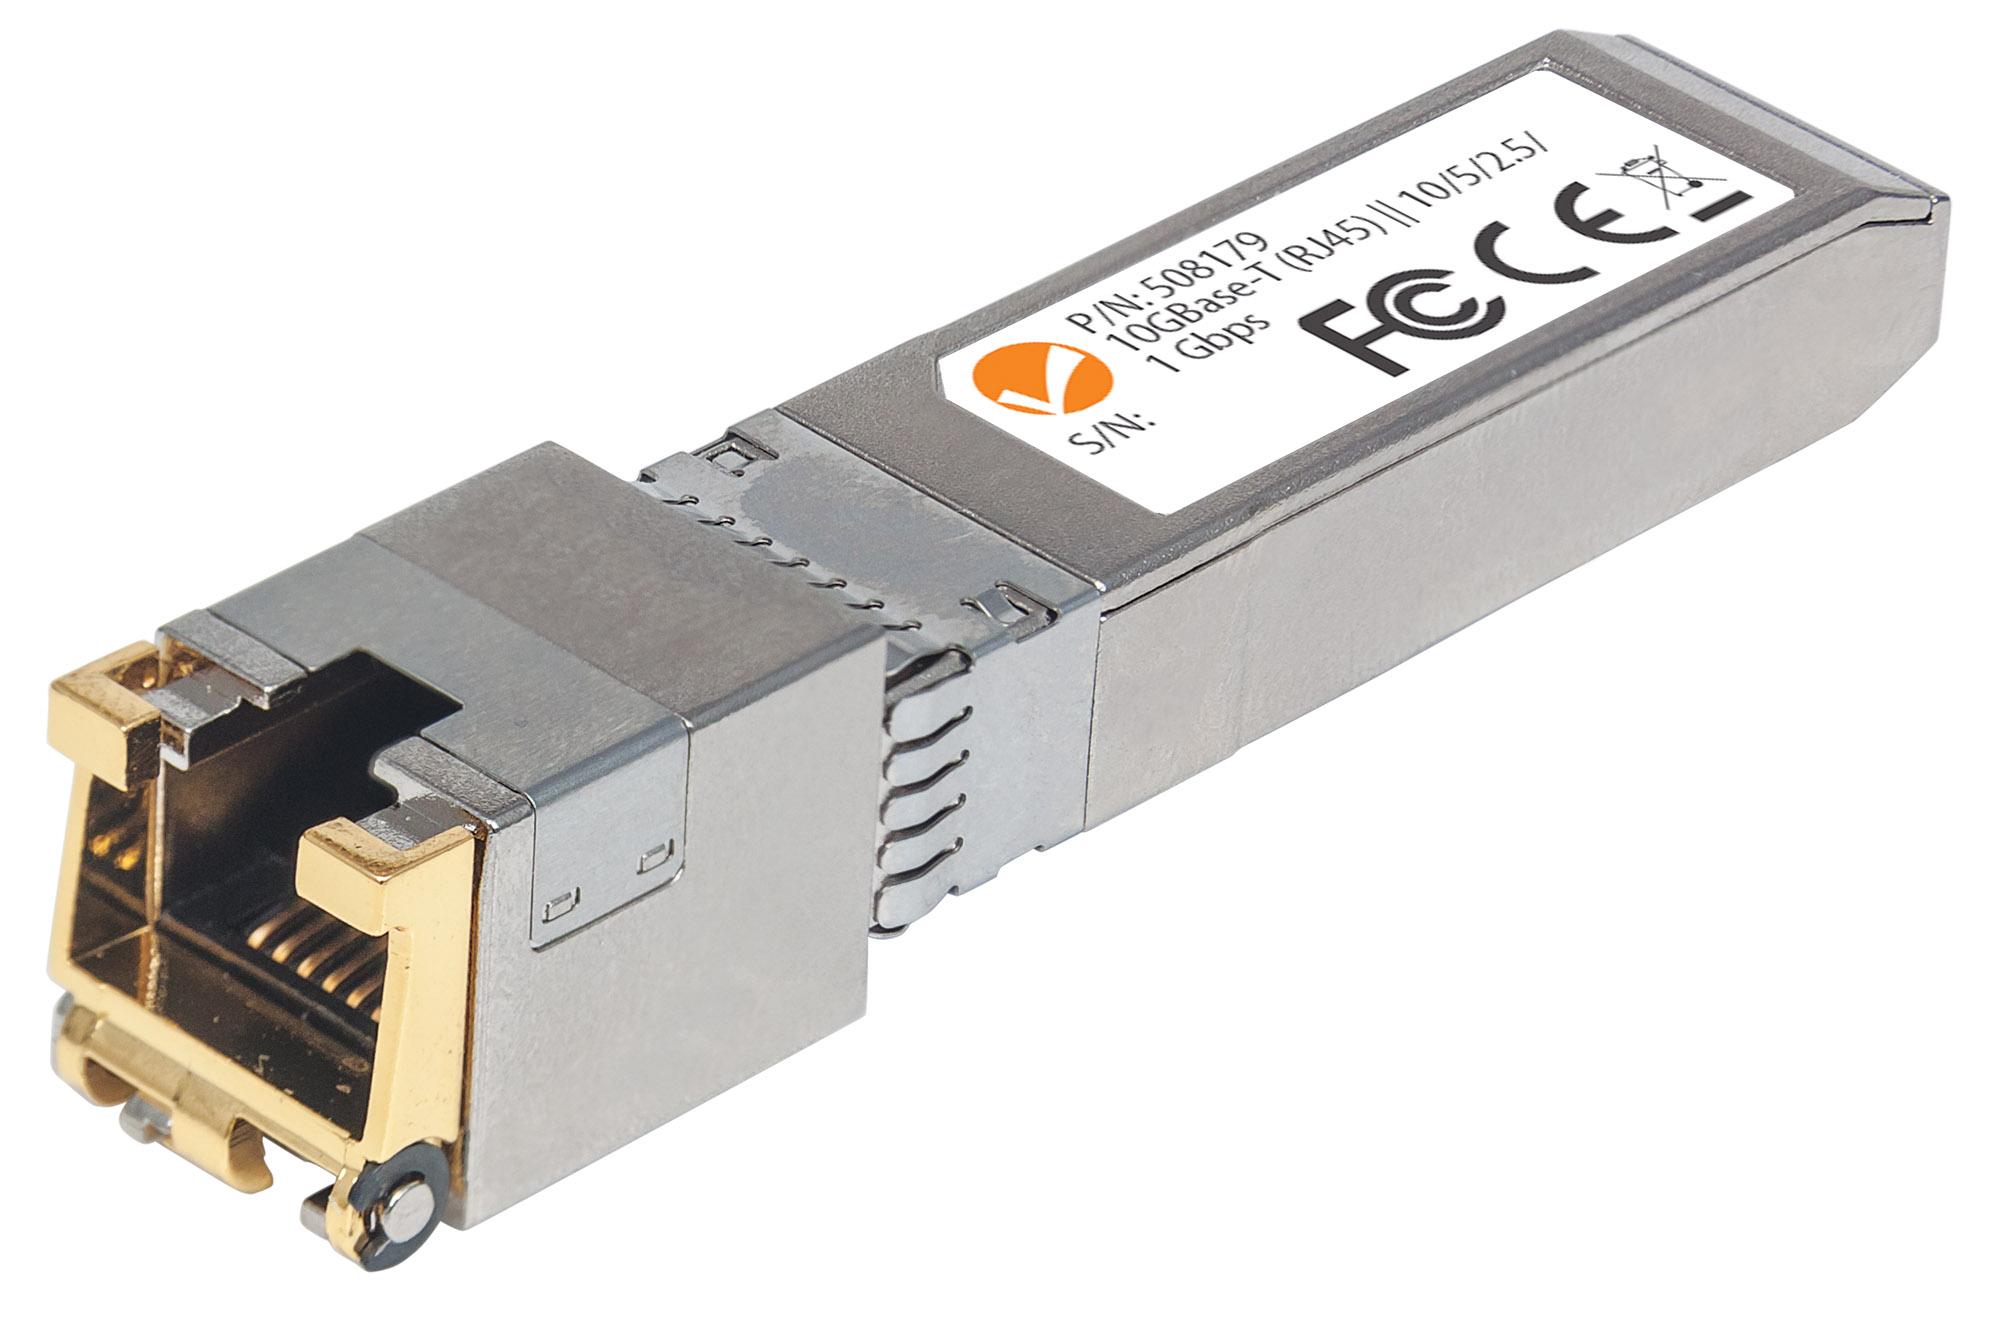 10 Gigabit Copper SFP+ Transceiver Module